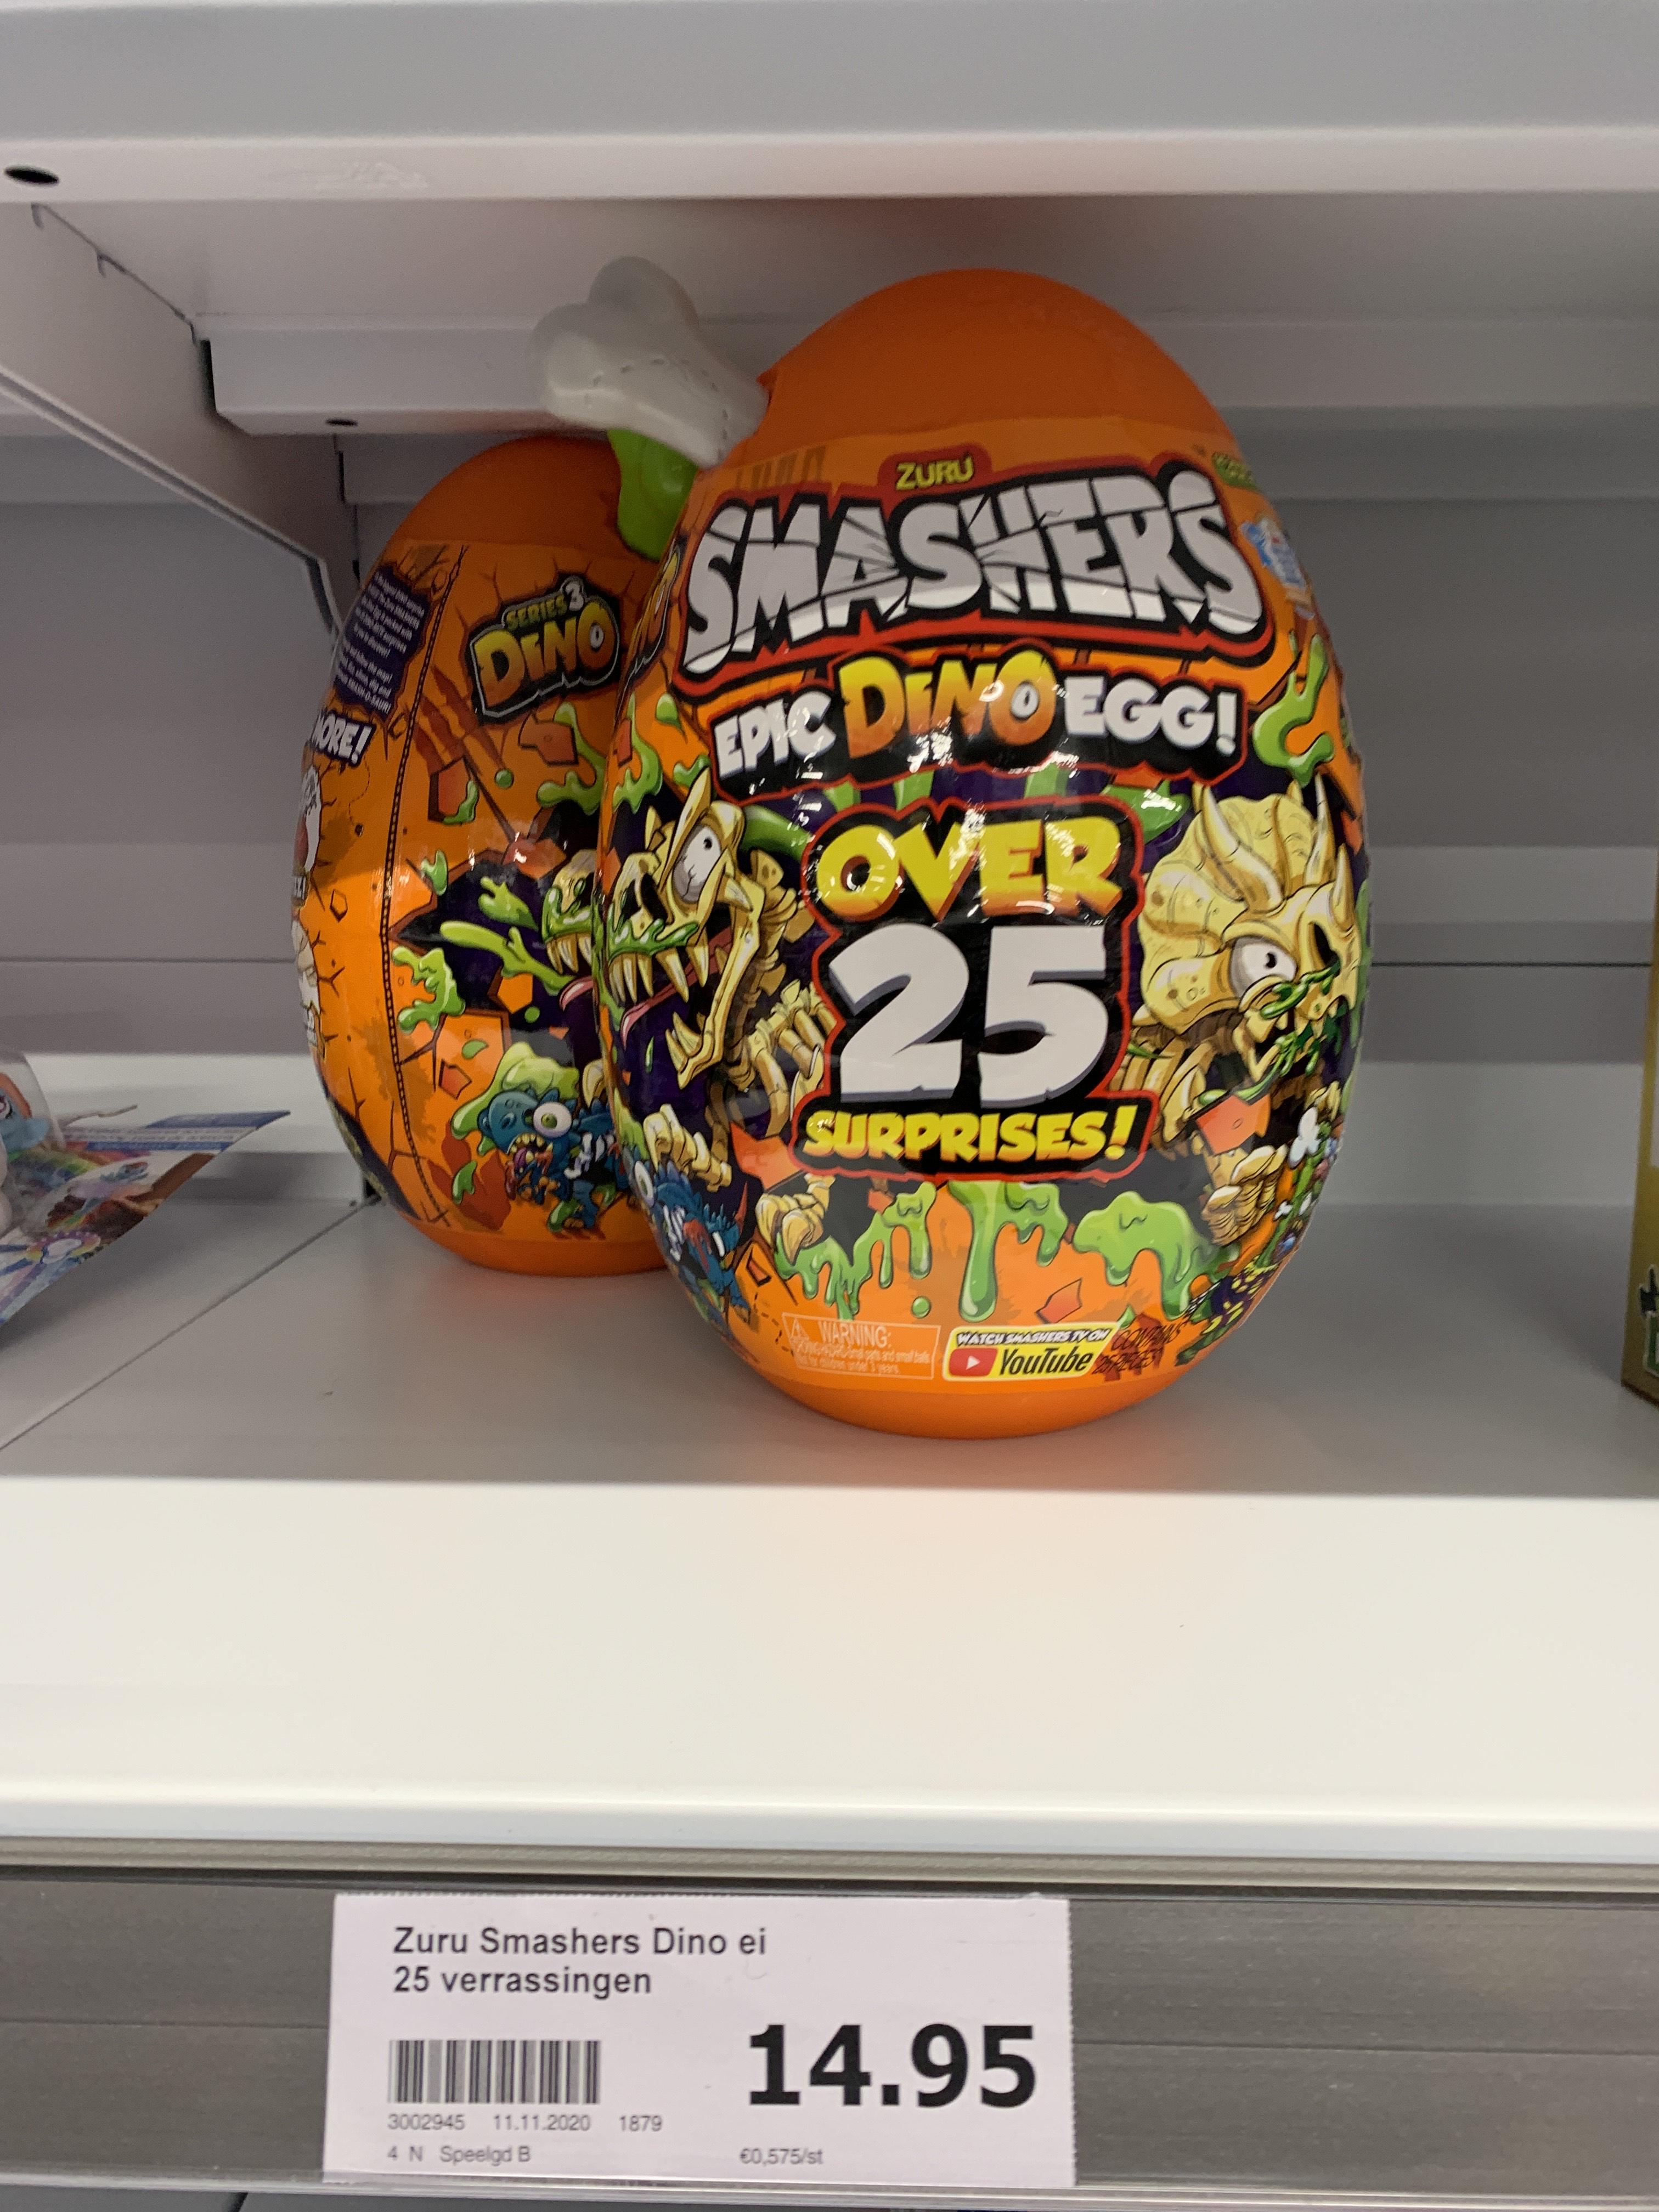 ACTION - ZURU SMASHERS Serie 3 Epic Dino Egg Collectibles